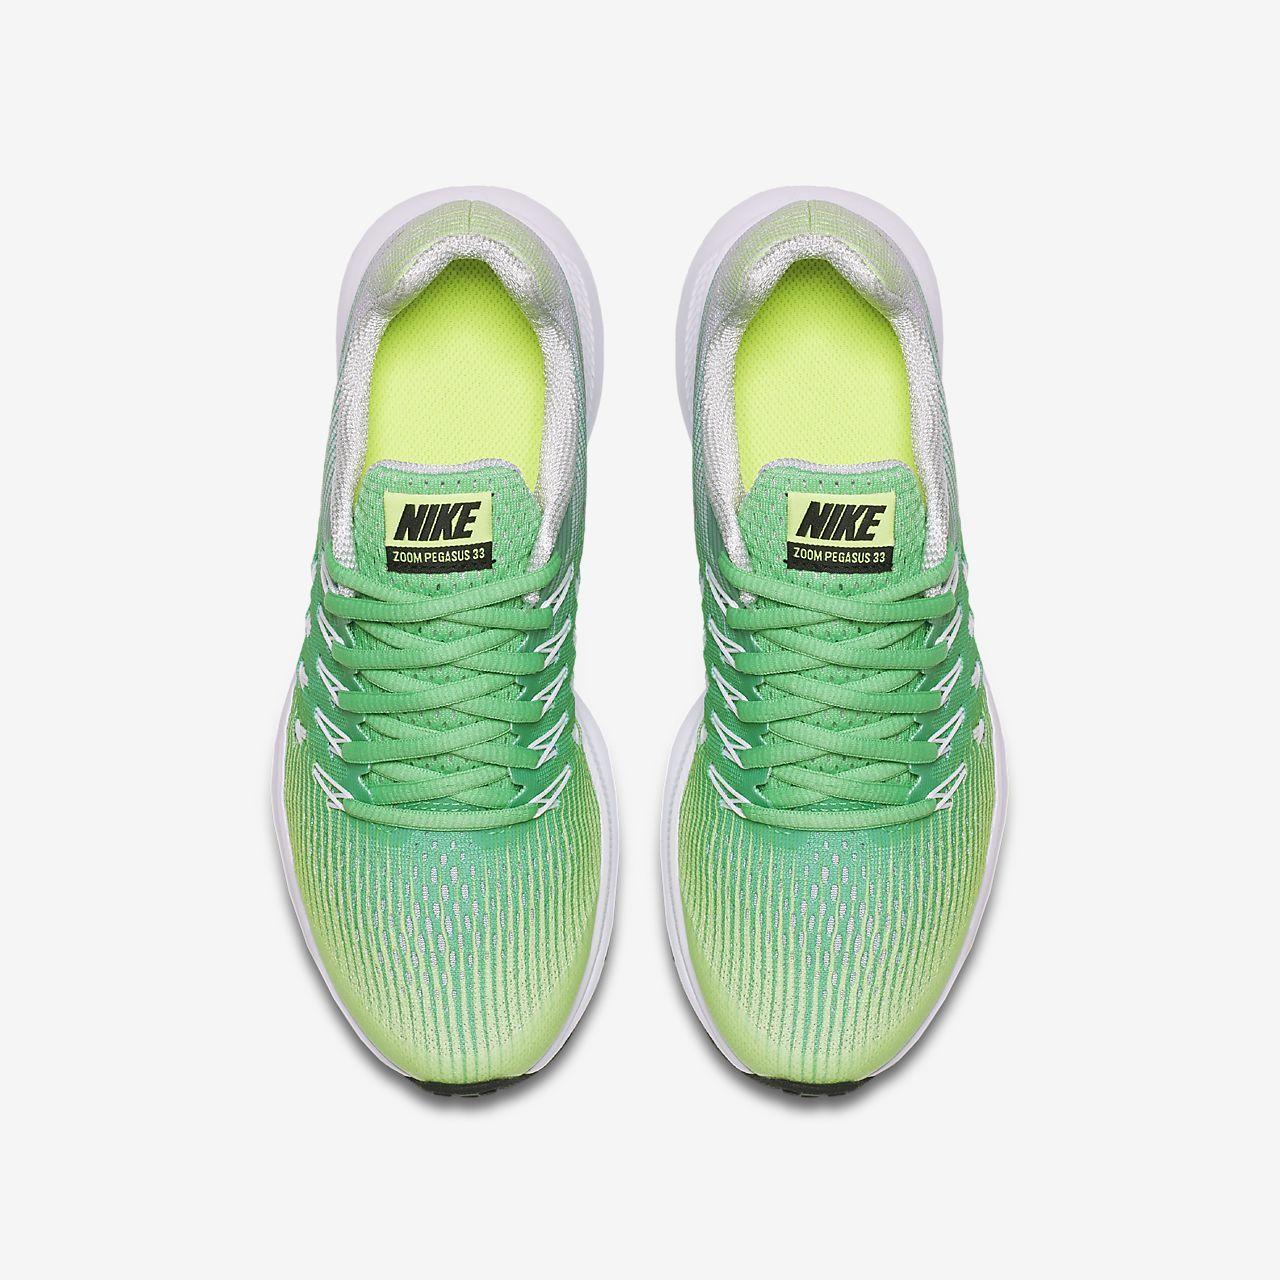 29cea1abb12 Nike Air Zoom Pegasus 33 Older Kids  Running Shoe. Nike.com EG